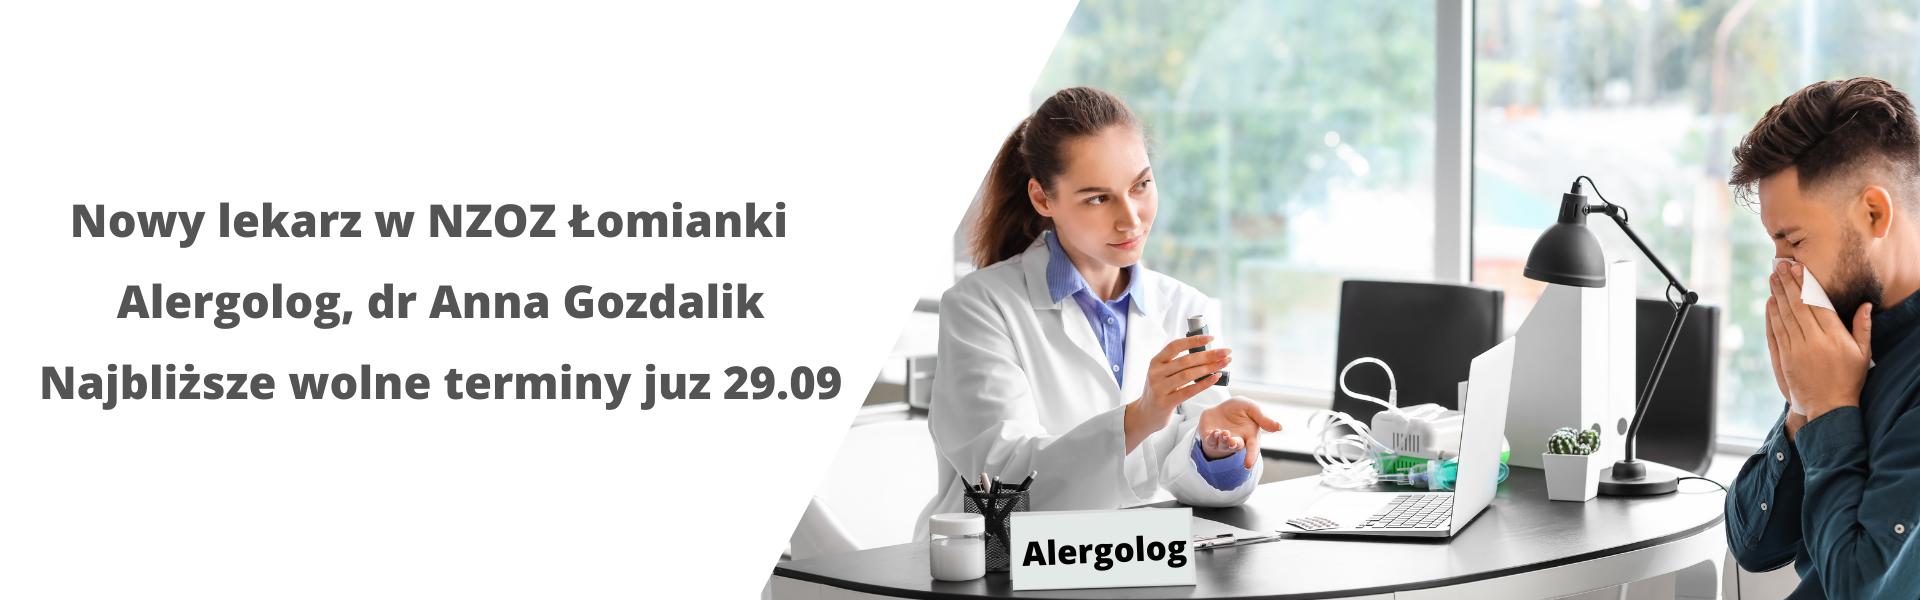 alergolog